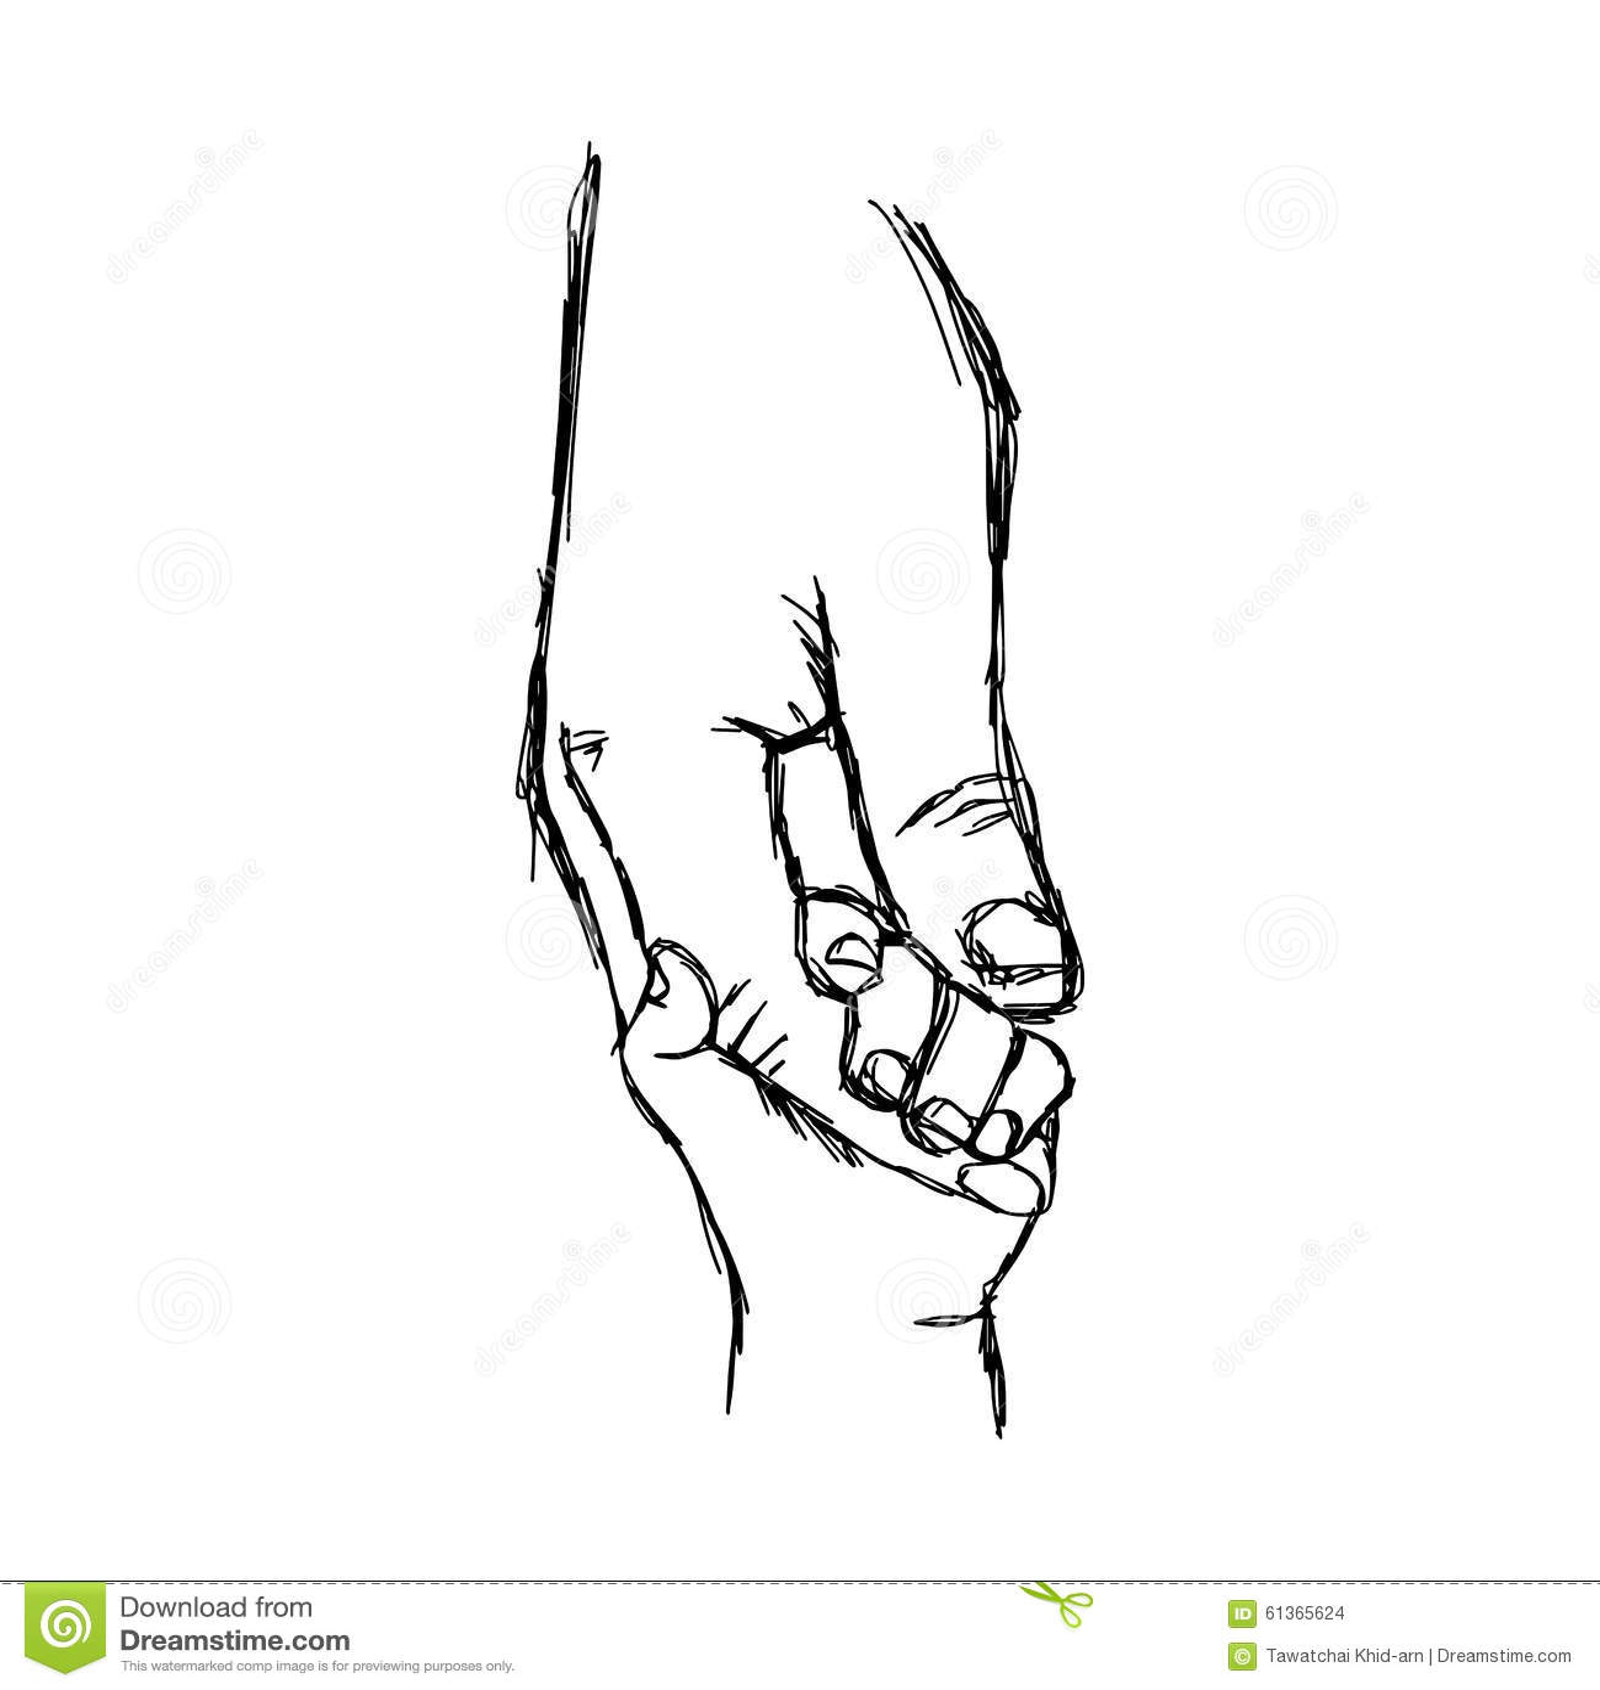 Illustration Vector Doodle Hand Drawn Sketch Of Parent